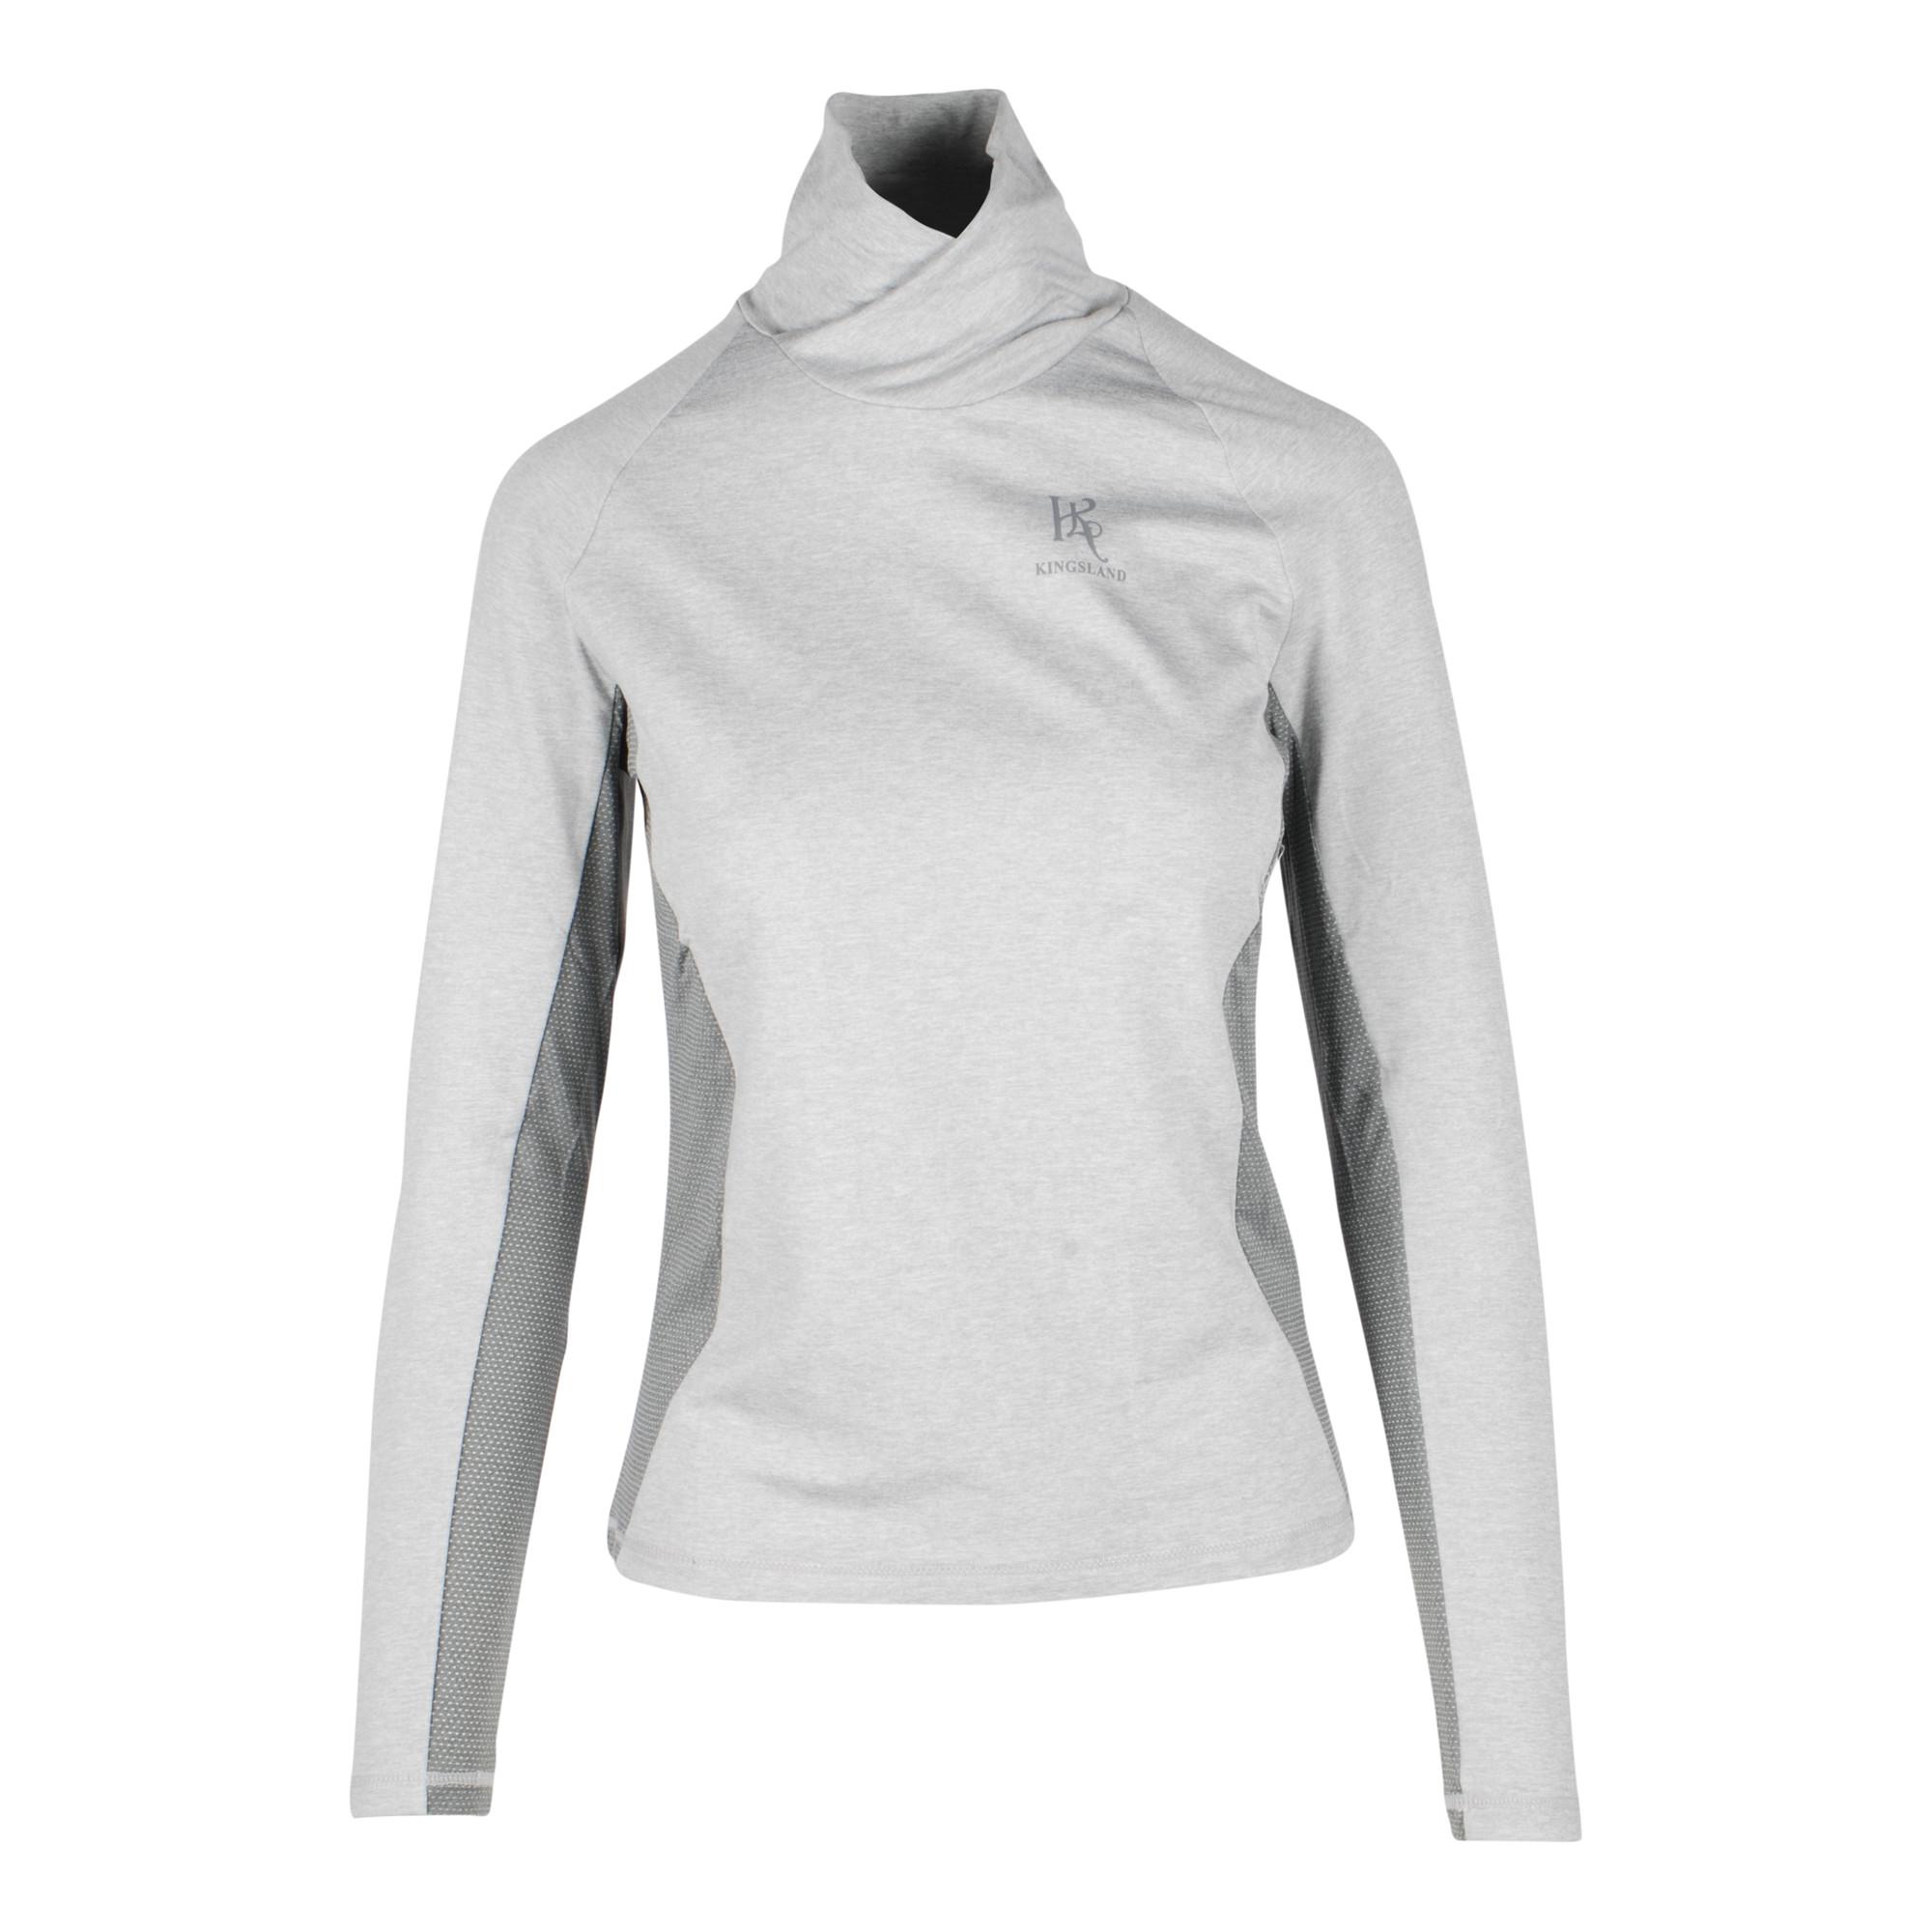 Kingsland Nora techshirt grijs maat:s